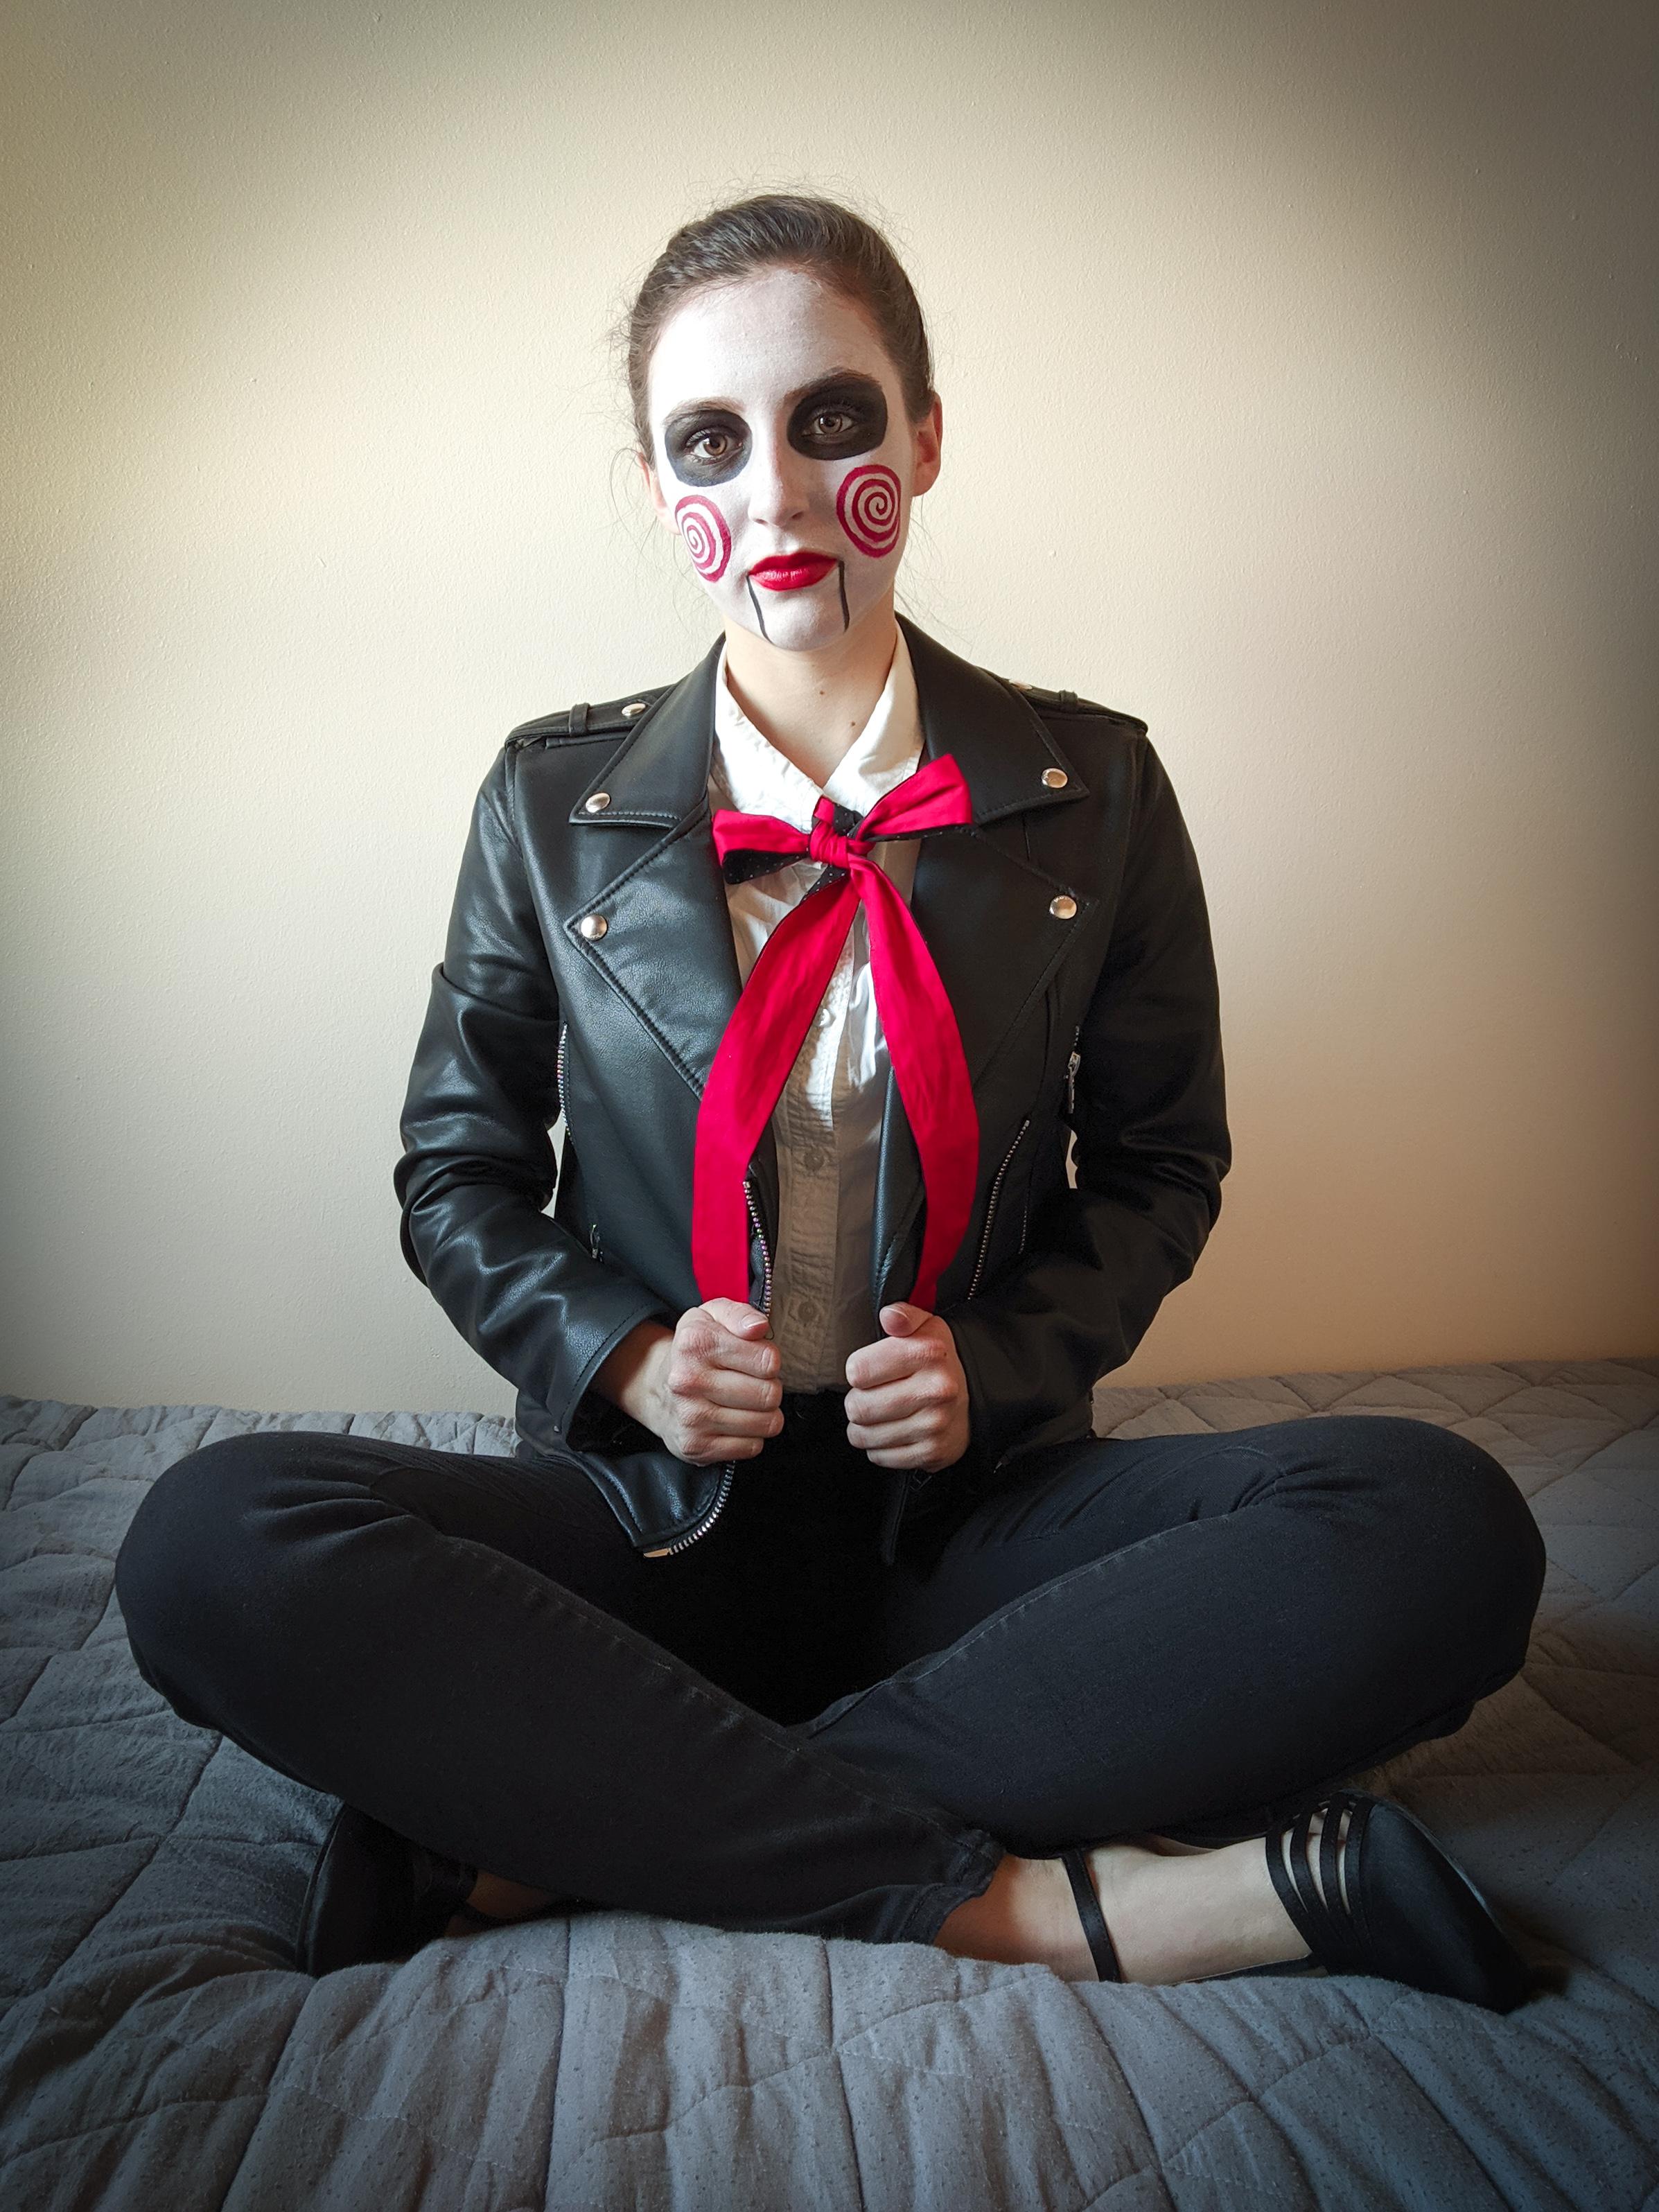 face paint, creepy Halloween, stylish costume